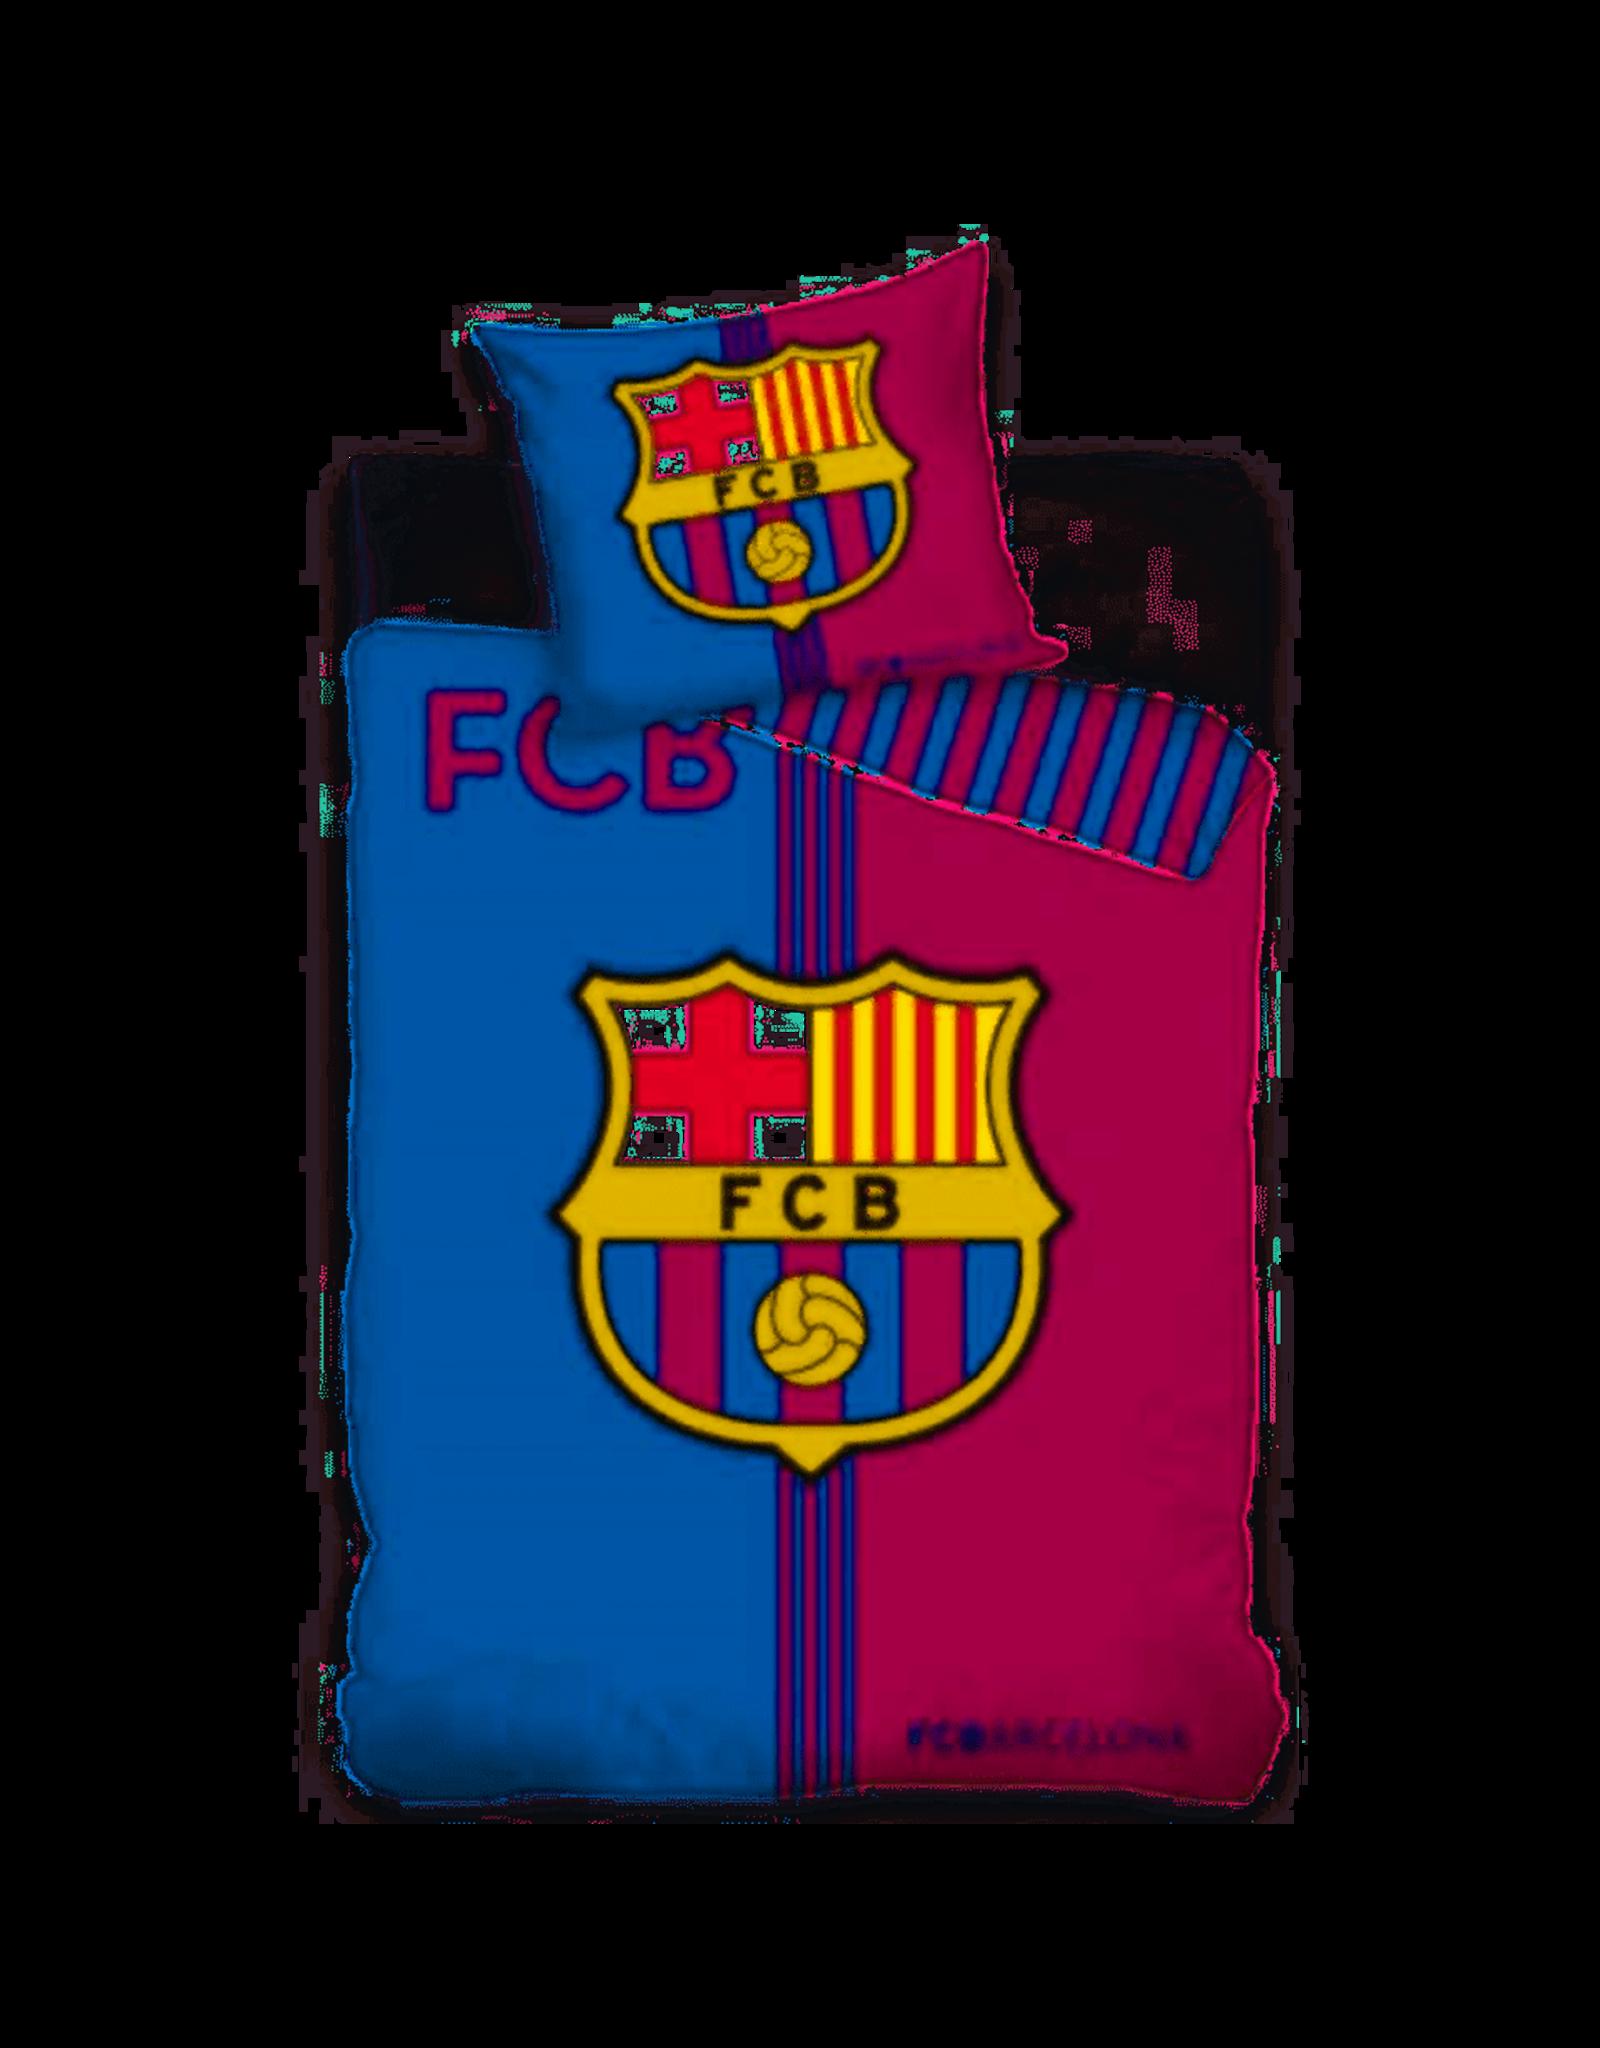 FCBARCELONA Dekbedovertrek FCB Barcelona